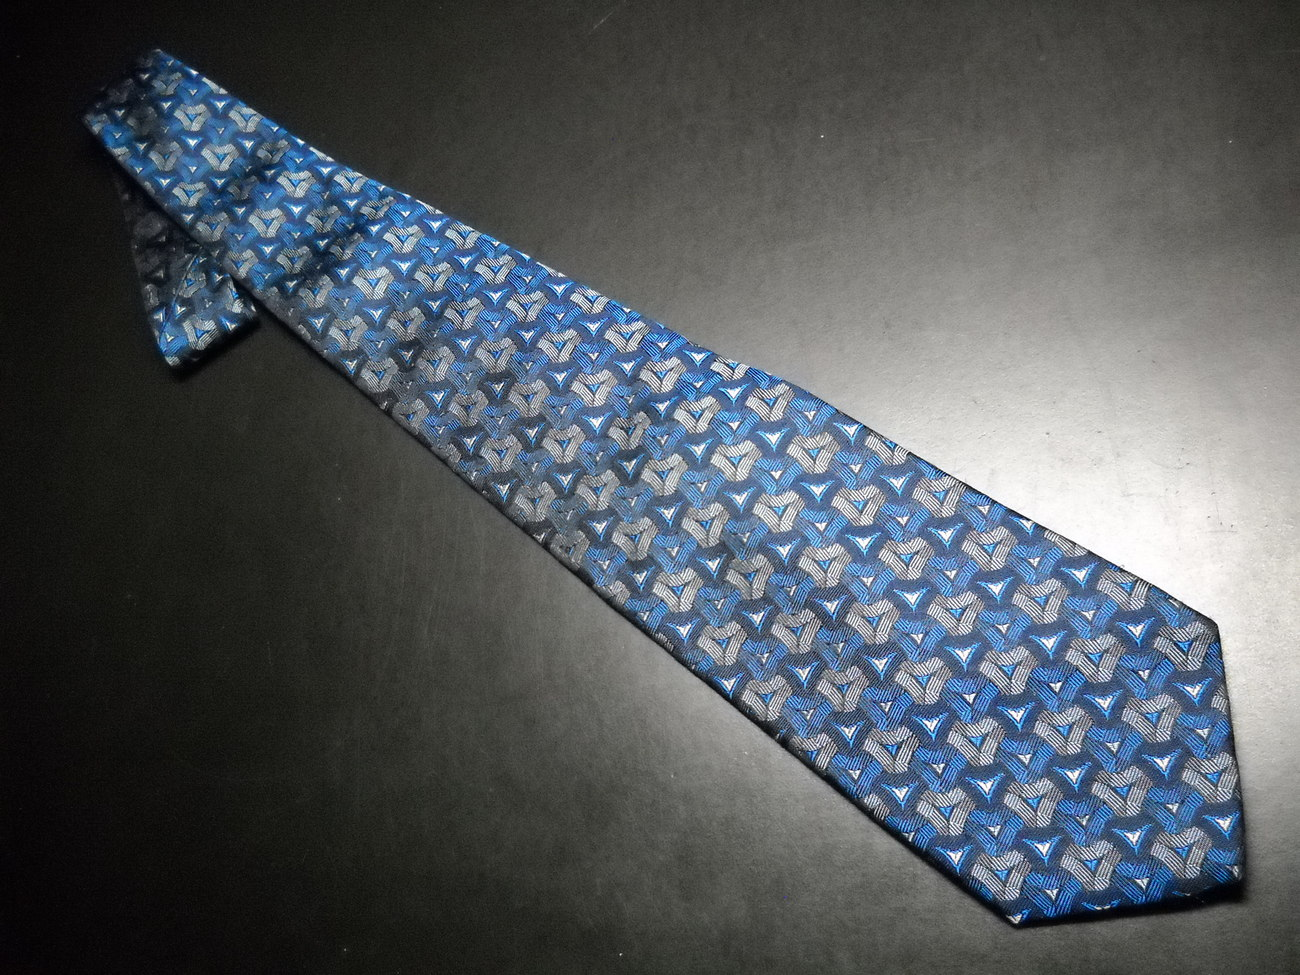 Tie robert talbott best of class nordstrom blues and greys 01